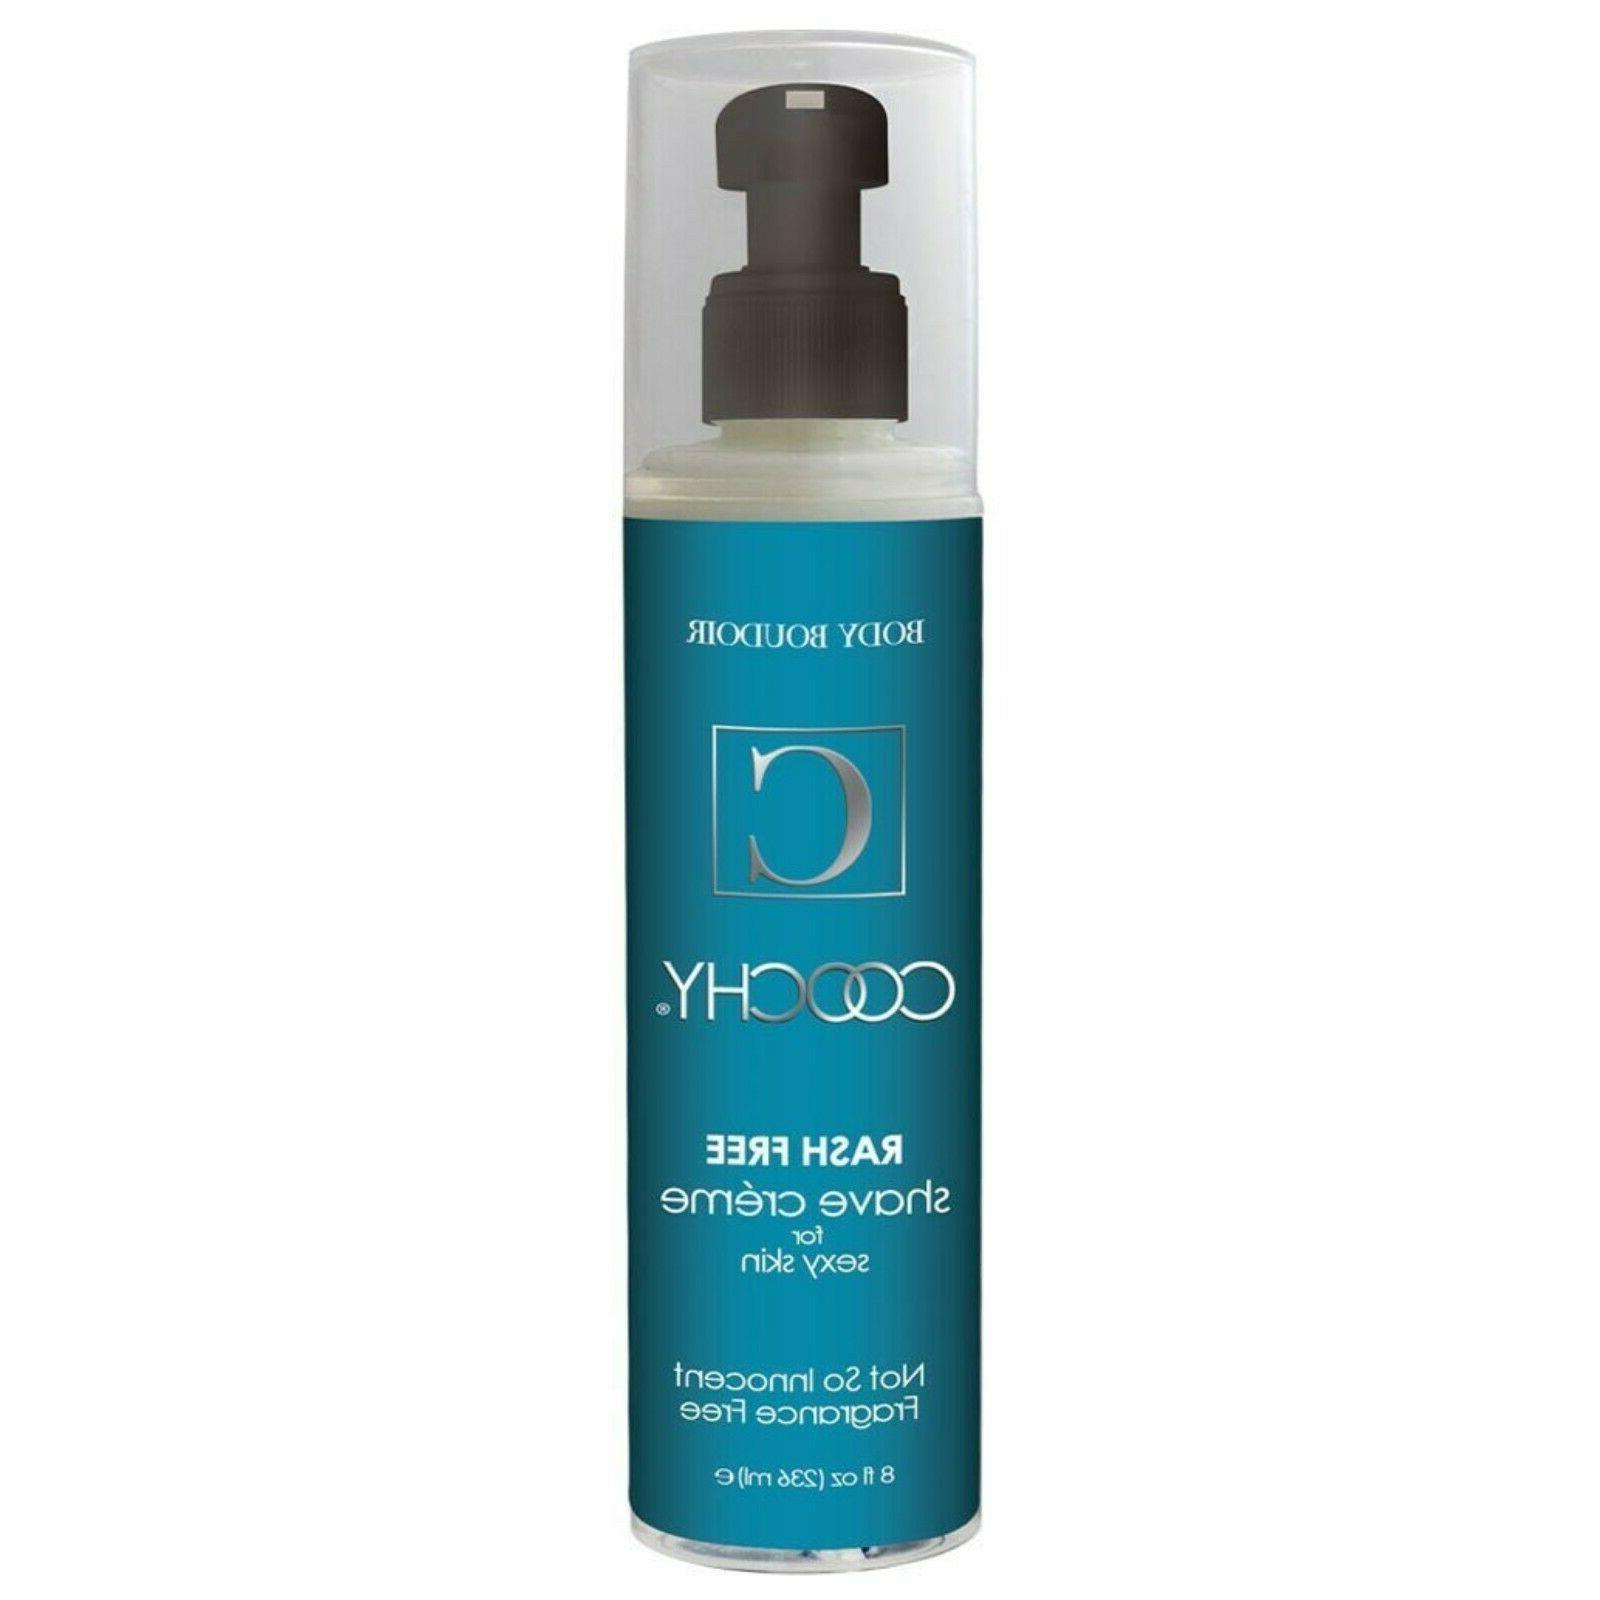 New Coochy Body Rashfree Shave Creme - 8 Oz Fragrance Free